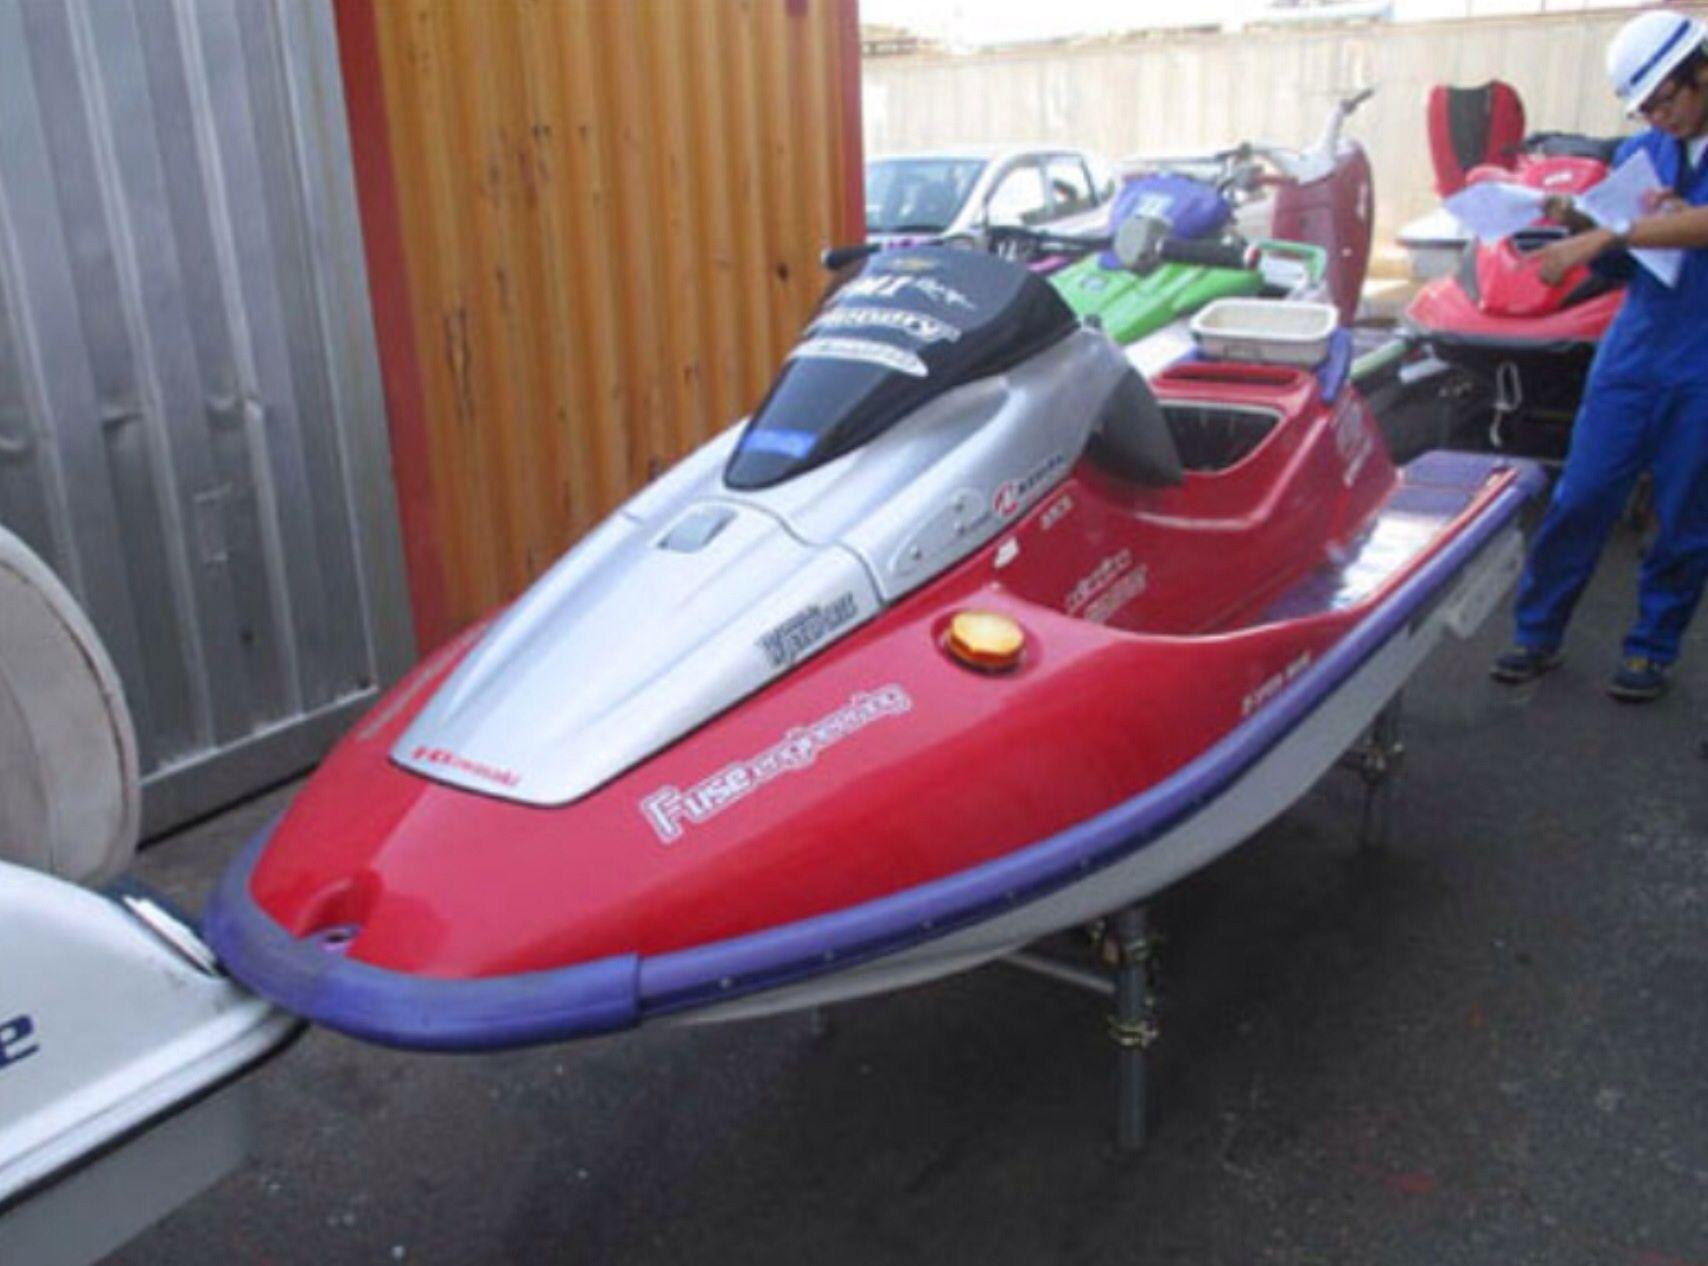 Clearance Of Japanese Jet Ski Kawasaki Zx1100 Red Mangalore Boats Ships Jet Ski Kawasaki Jet Ski Kawasaki